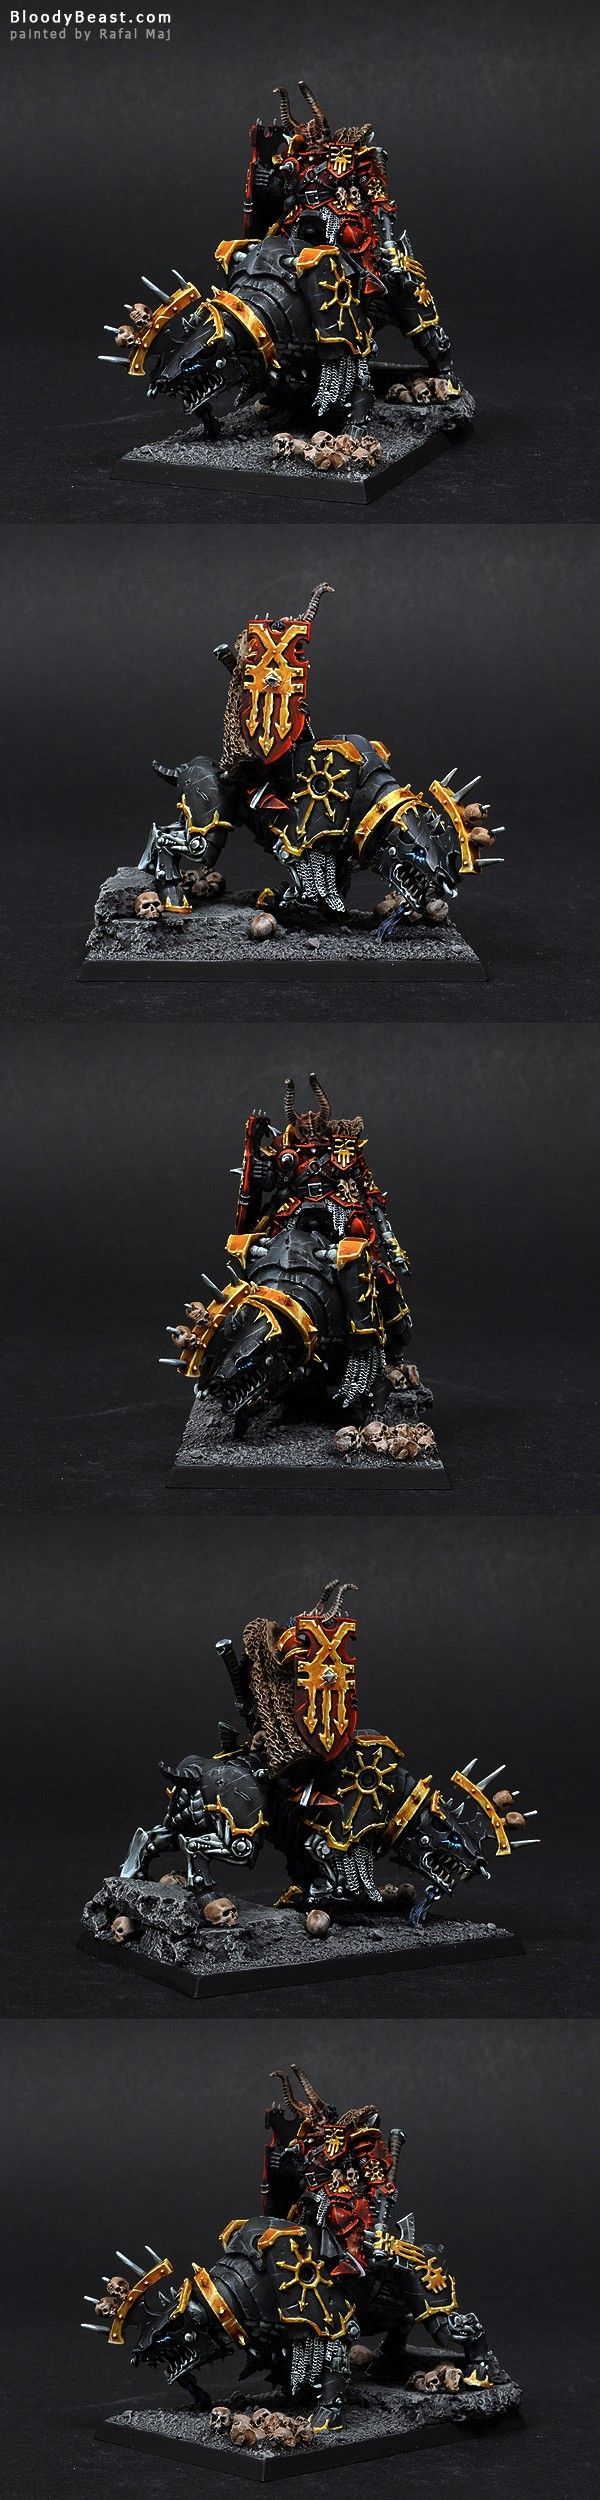 Khorne Chaos Lord on Juggernaut